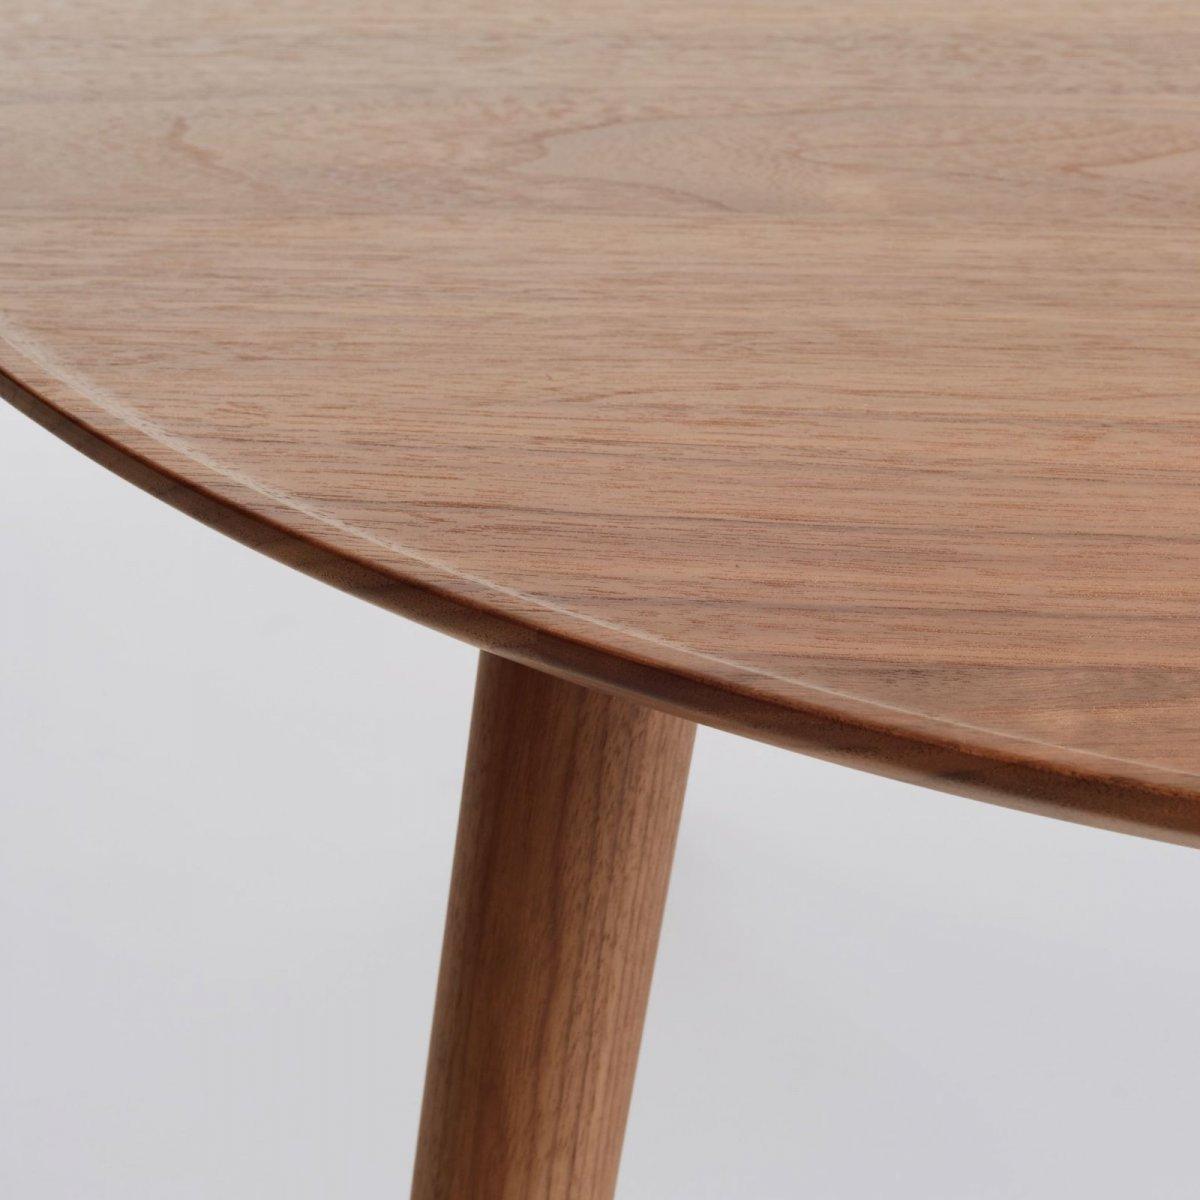 Edge Coffee Table, detail.